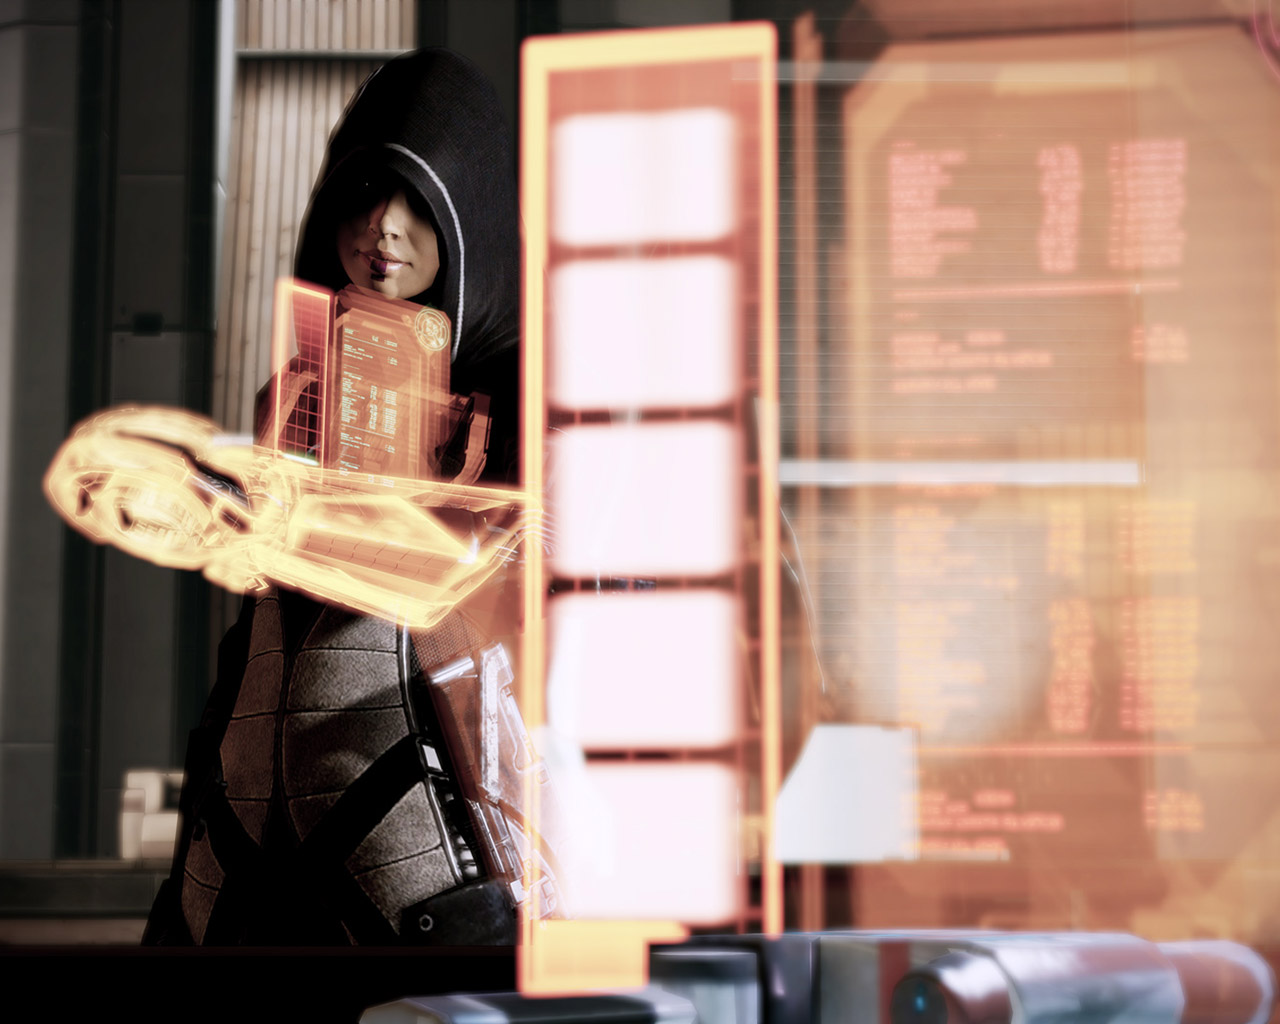 Free Mass Effect 2 Wallpaper in 1280x1024